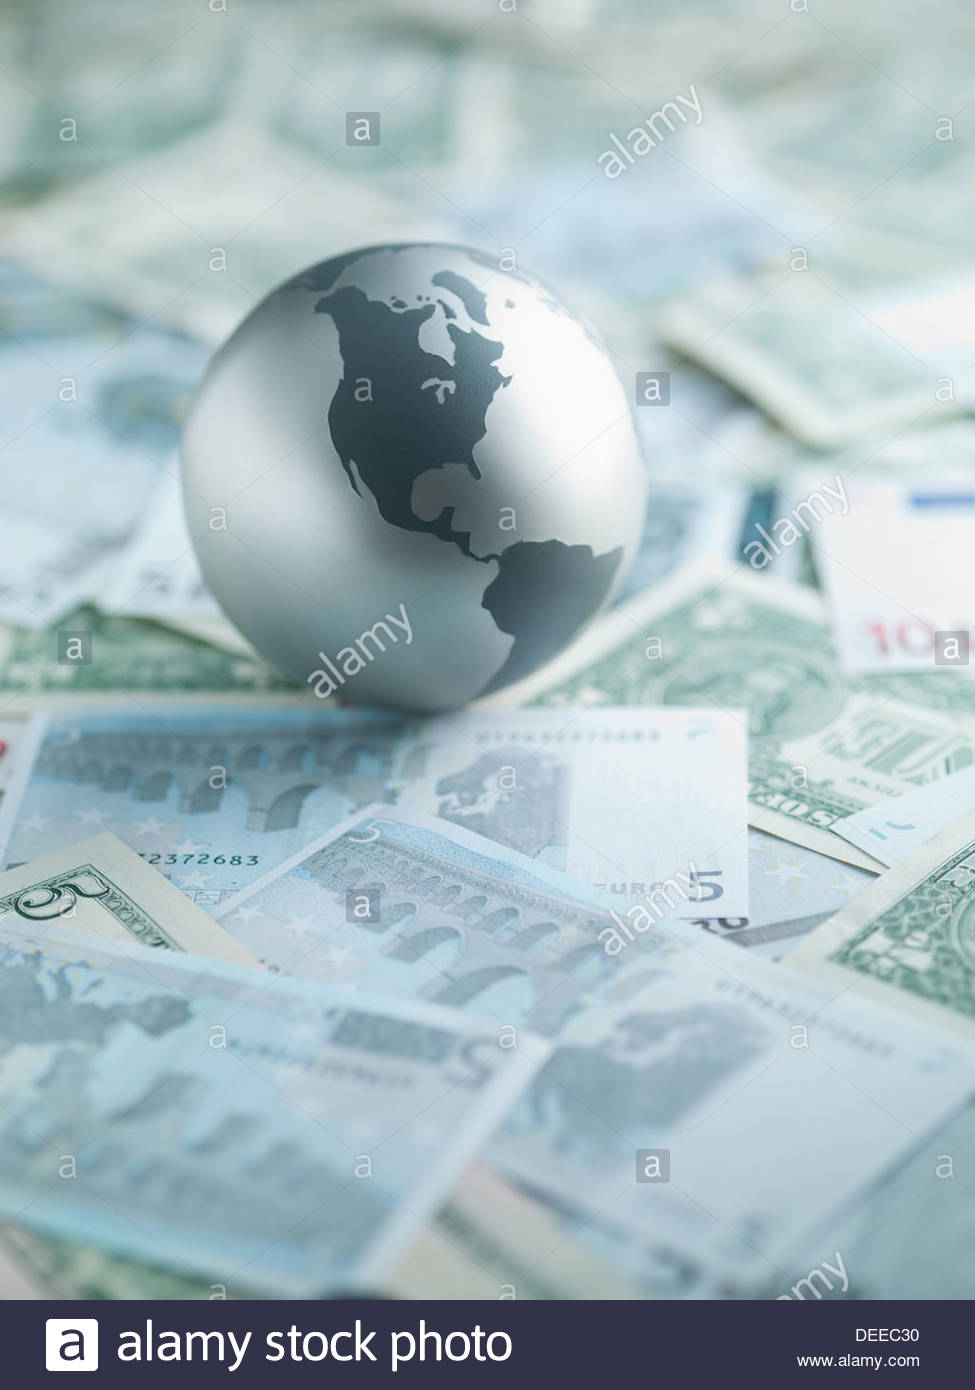 Metall Kugel ruht auf Papiergeld Stockbild